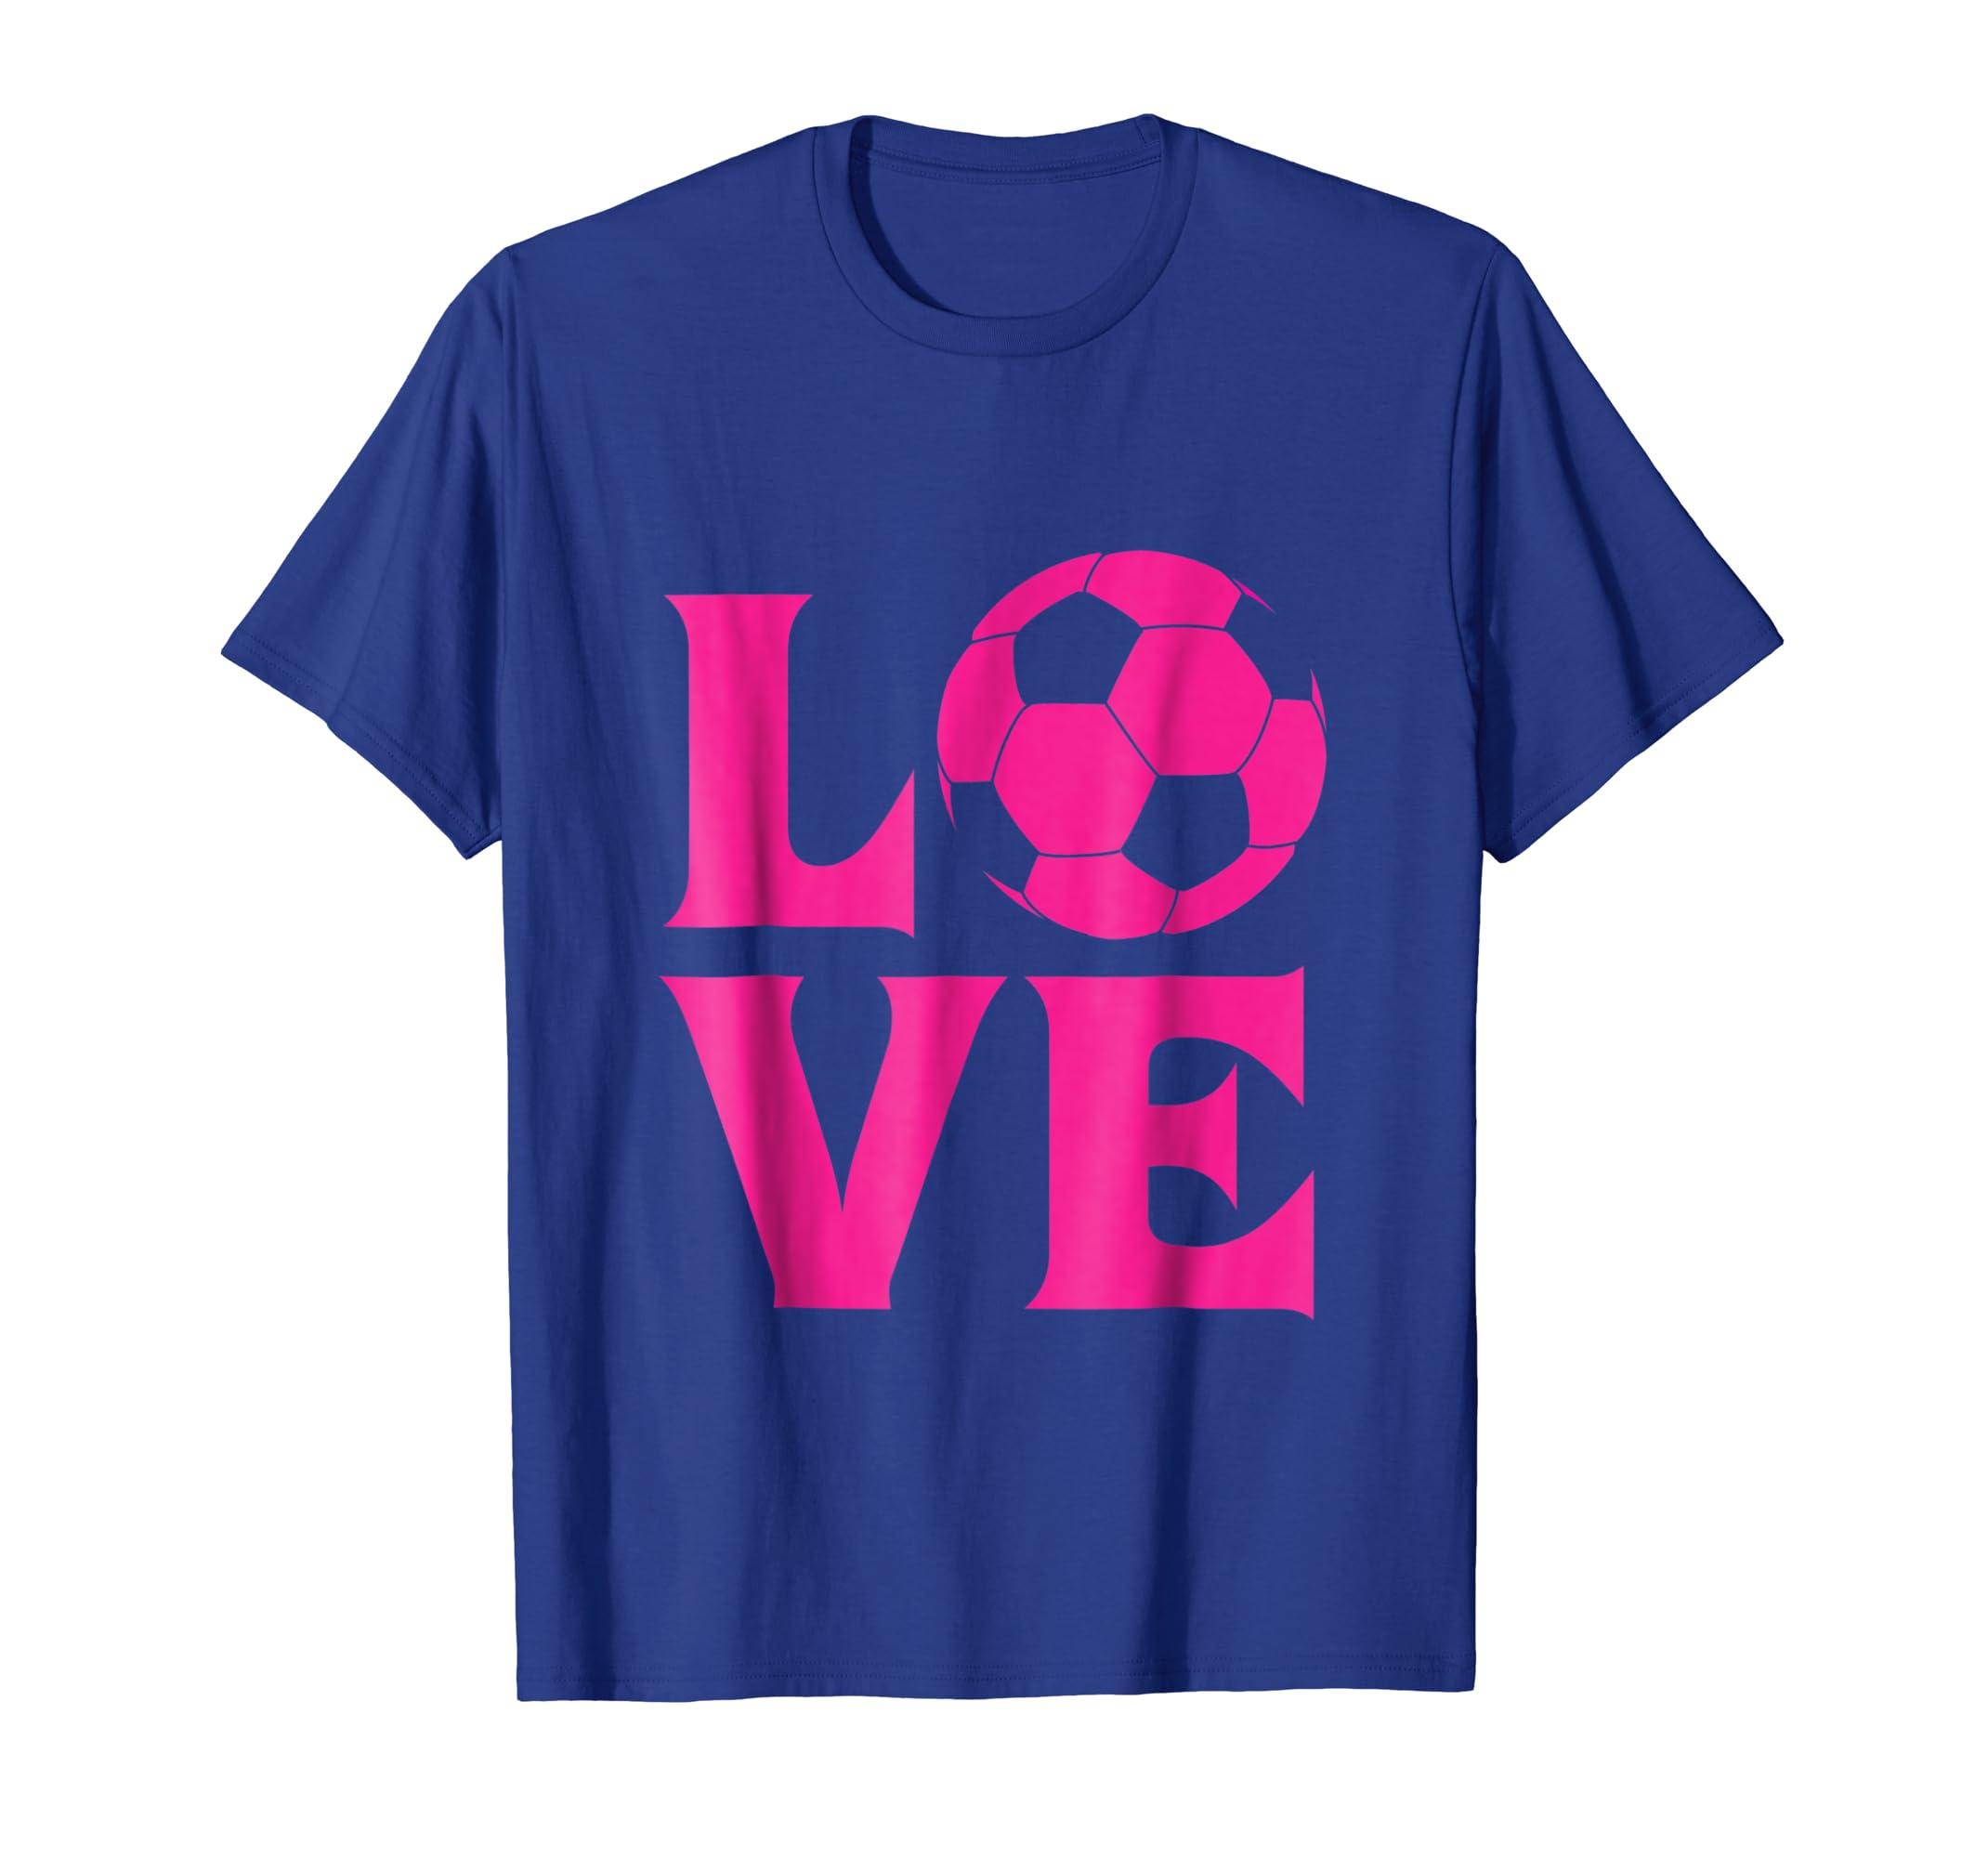 ae46add4b Amazon.com  I love soccer shirt for women